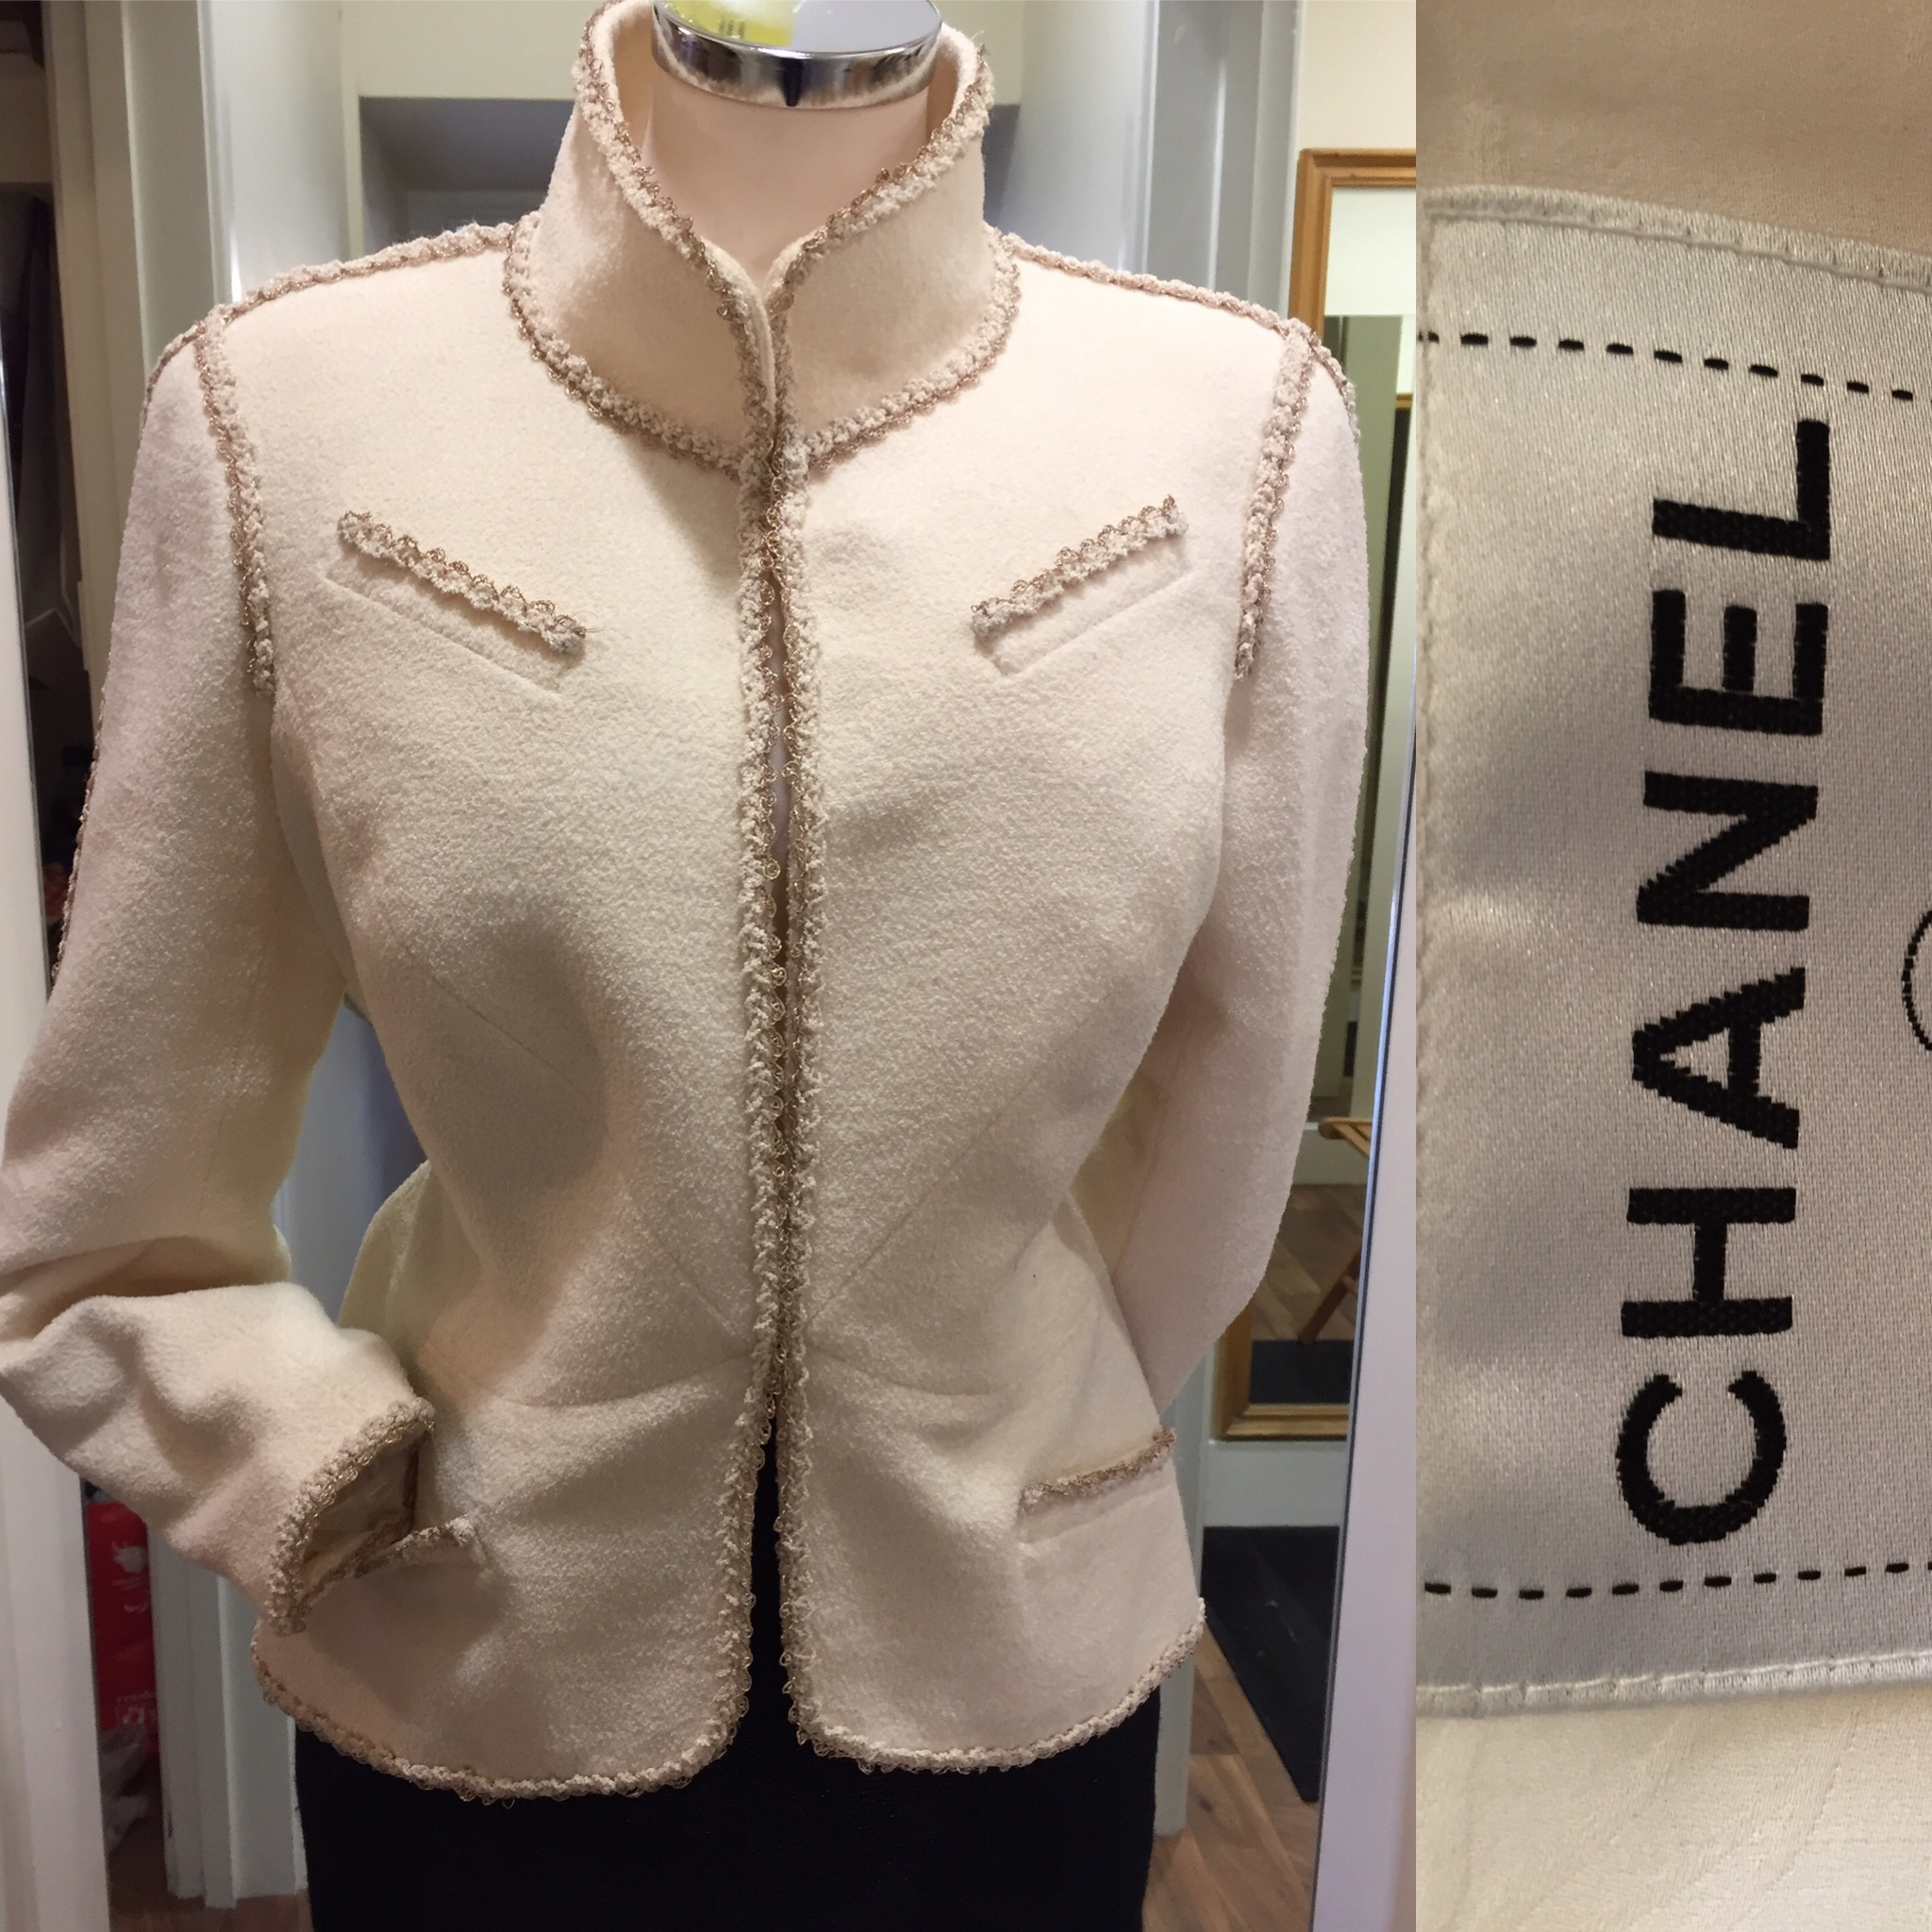 Chanel Jacket £499.jpg